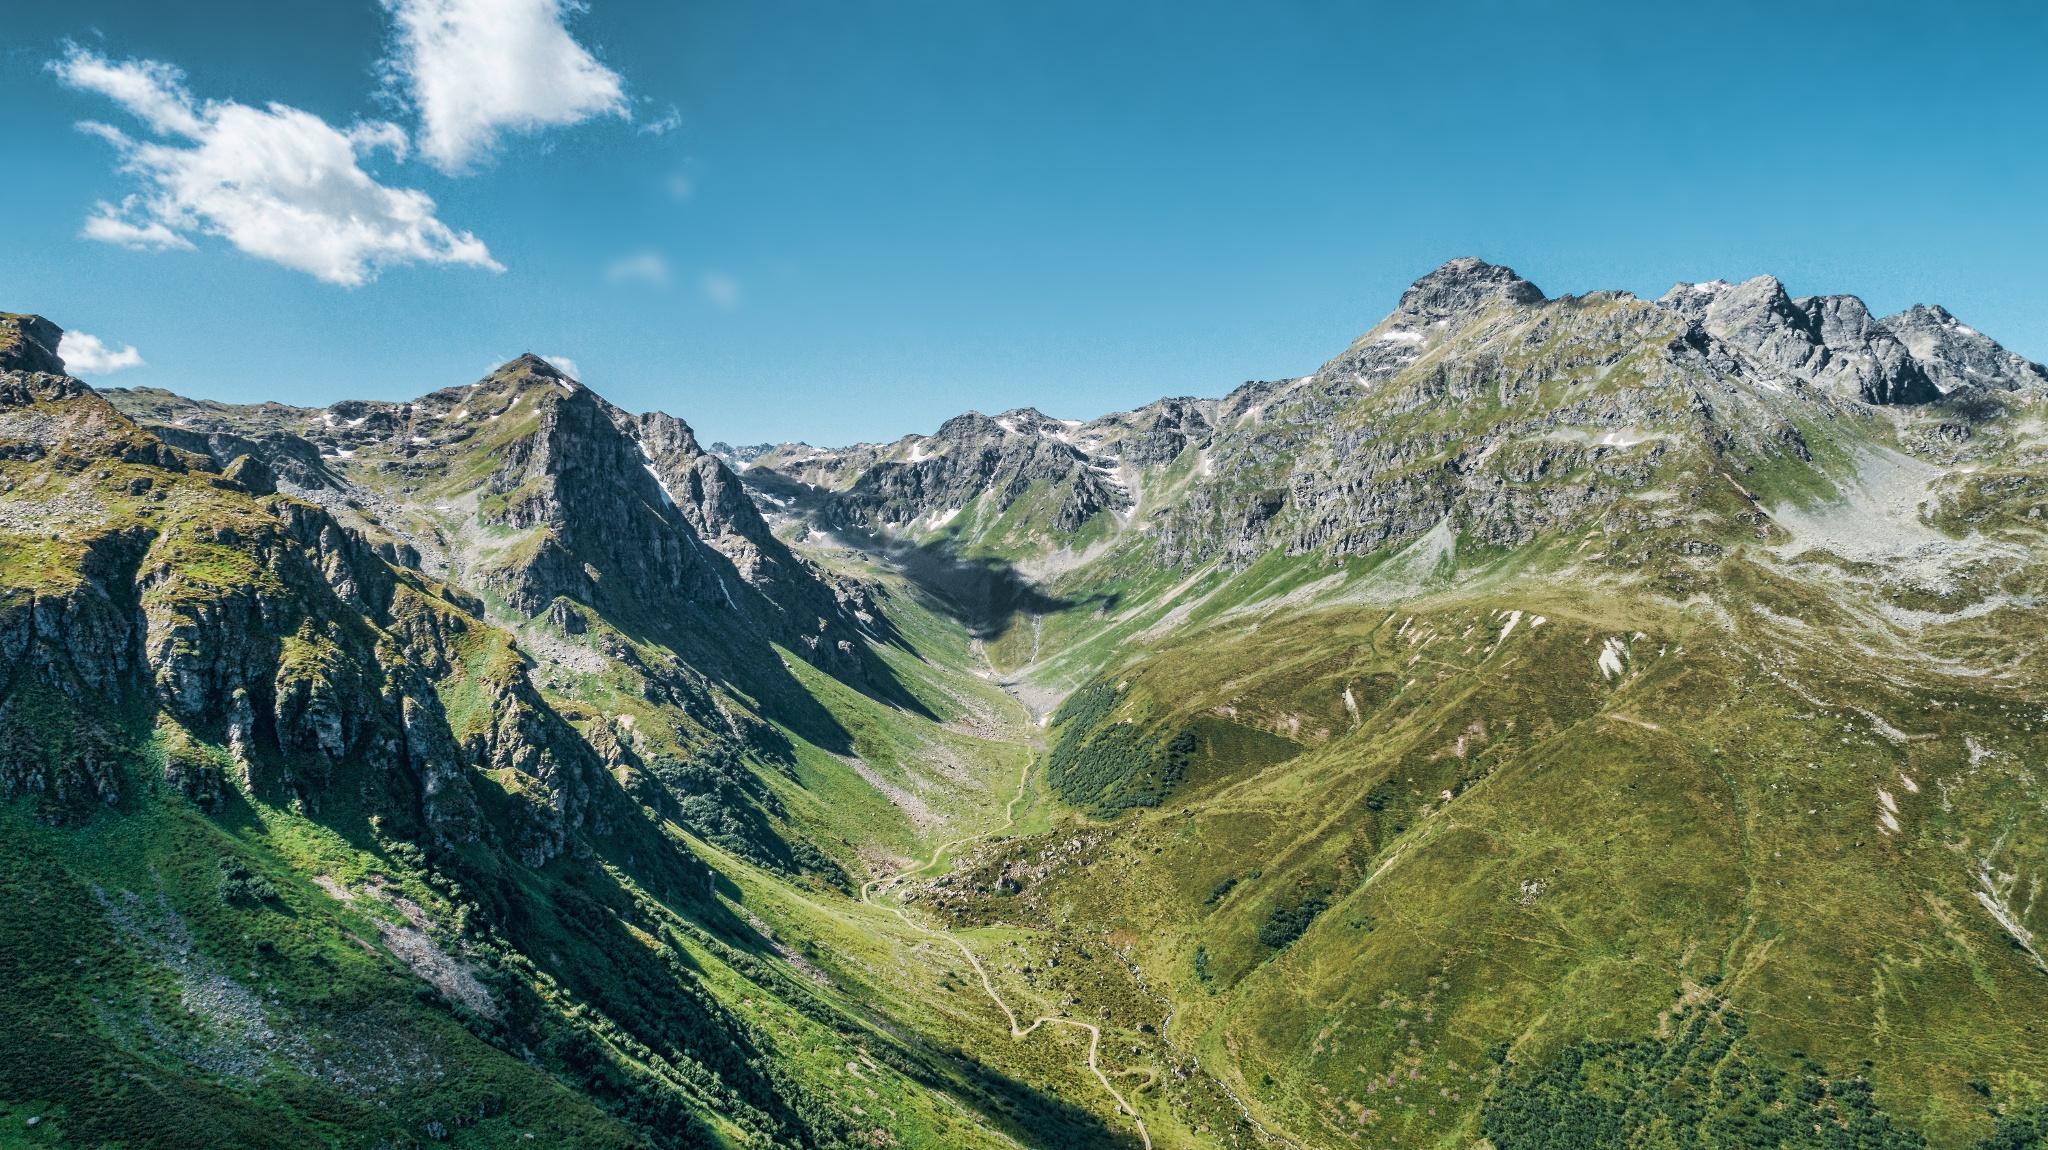 Klettersteig Madrisella : Klettersteig madrisella Österreichs wanderdörfer